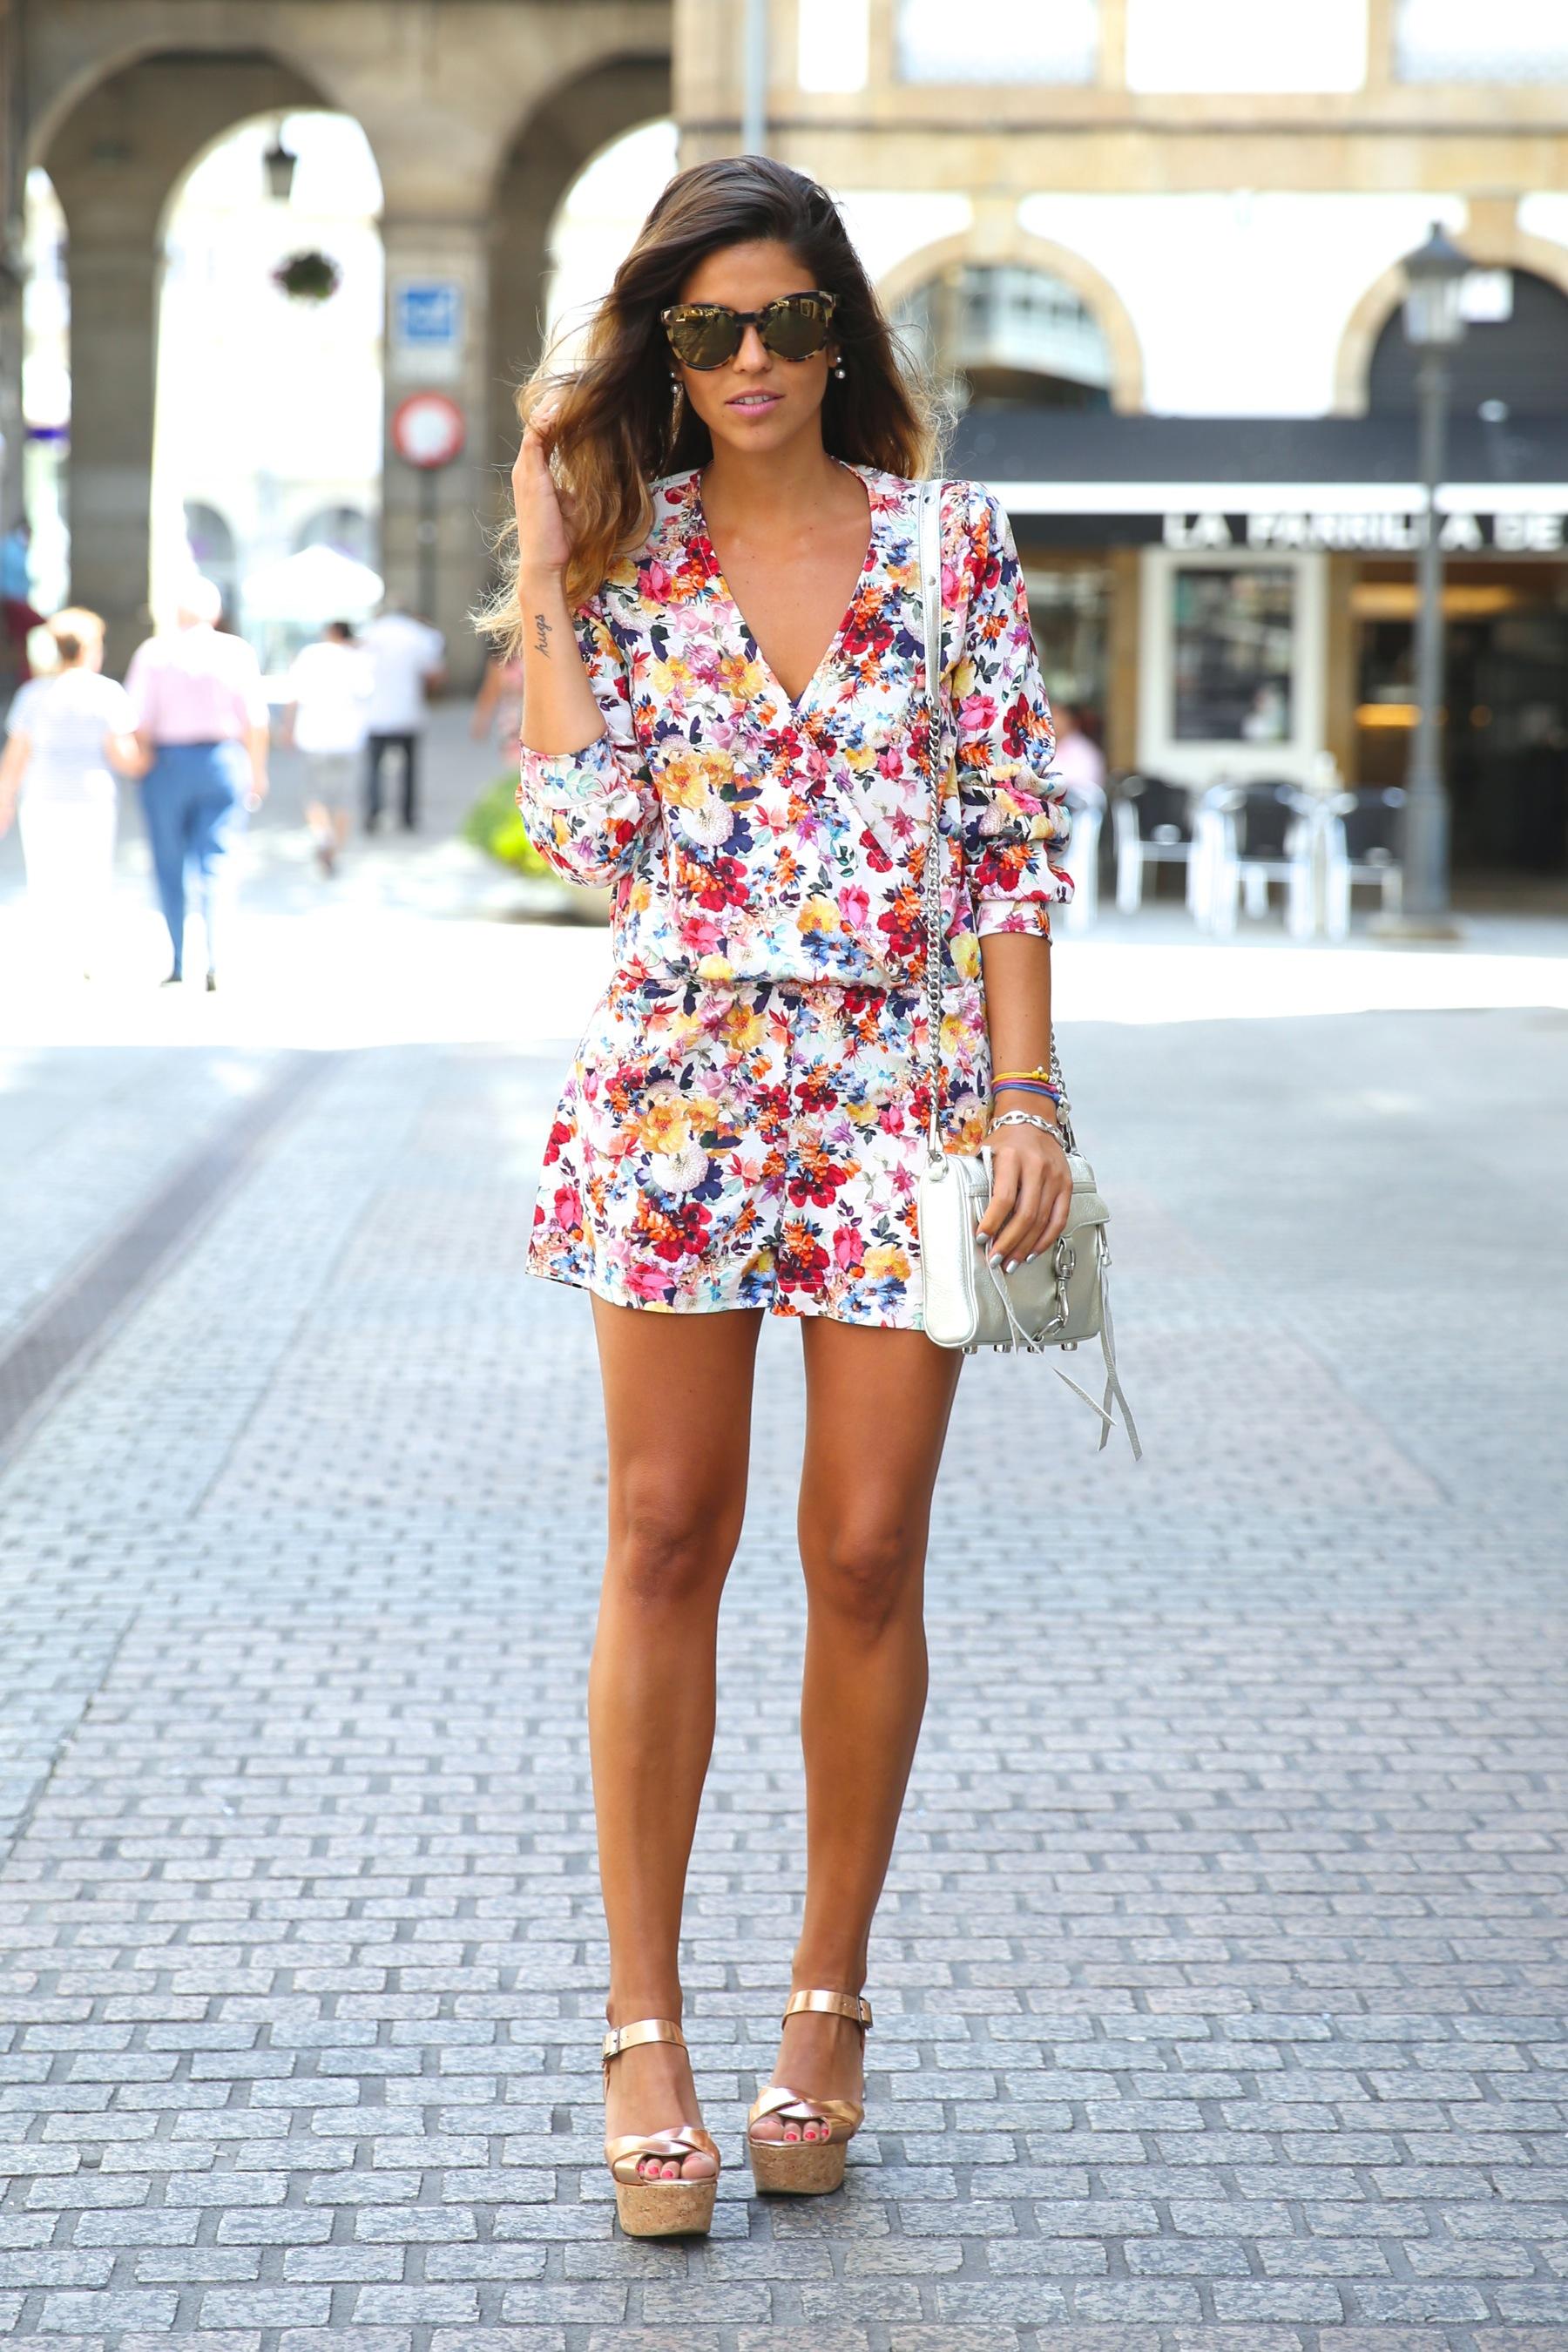 trendy_taste-look-outfit-street_style-ootd-blog-blogger-fashion_spain-moda_españa-mono-flores-flower_print-verano-summer-overall-la_coruña-11